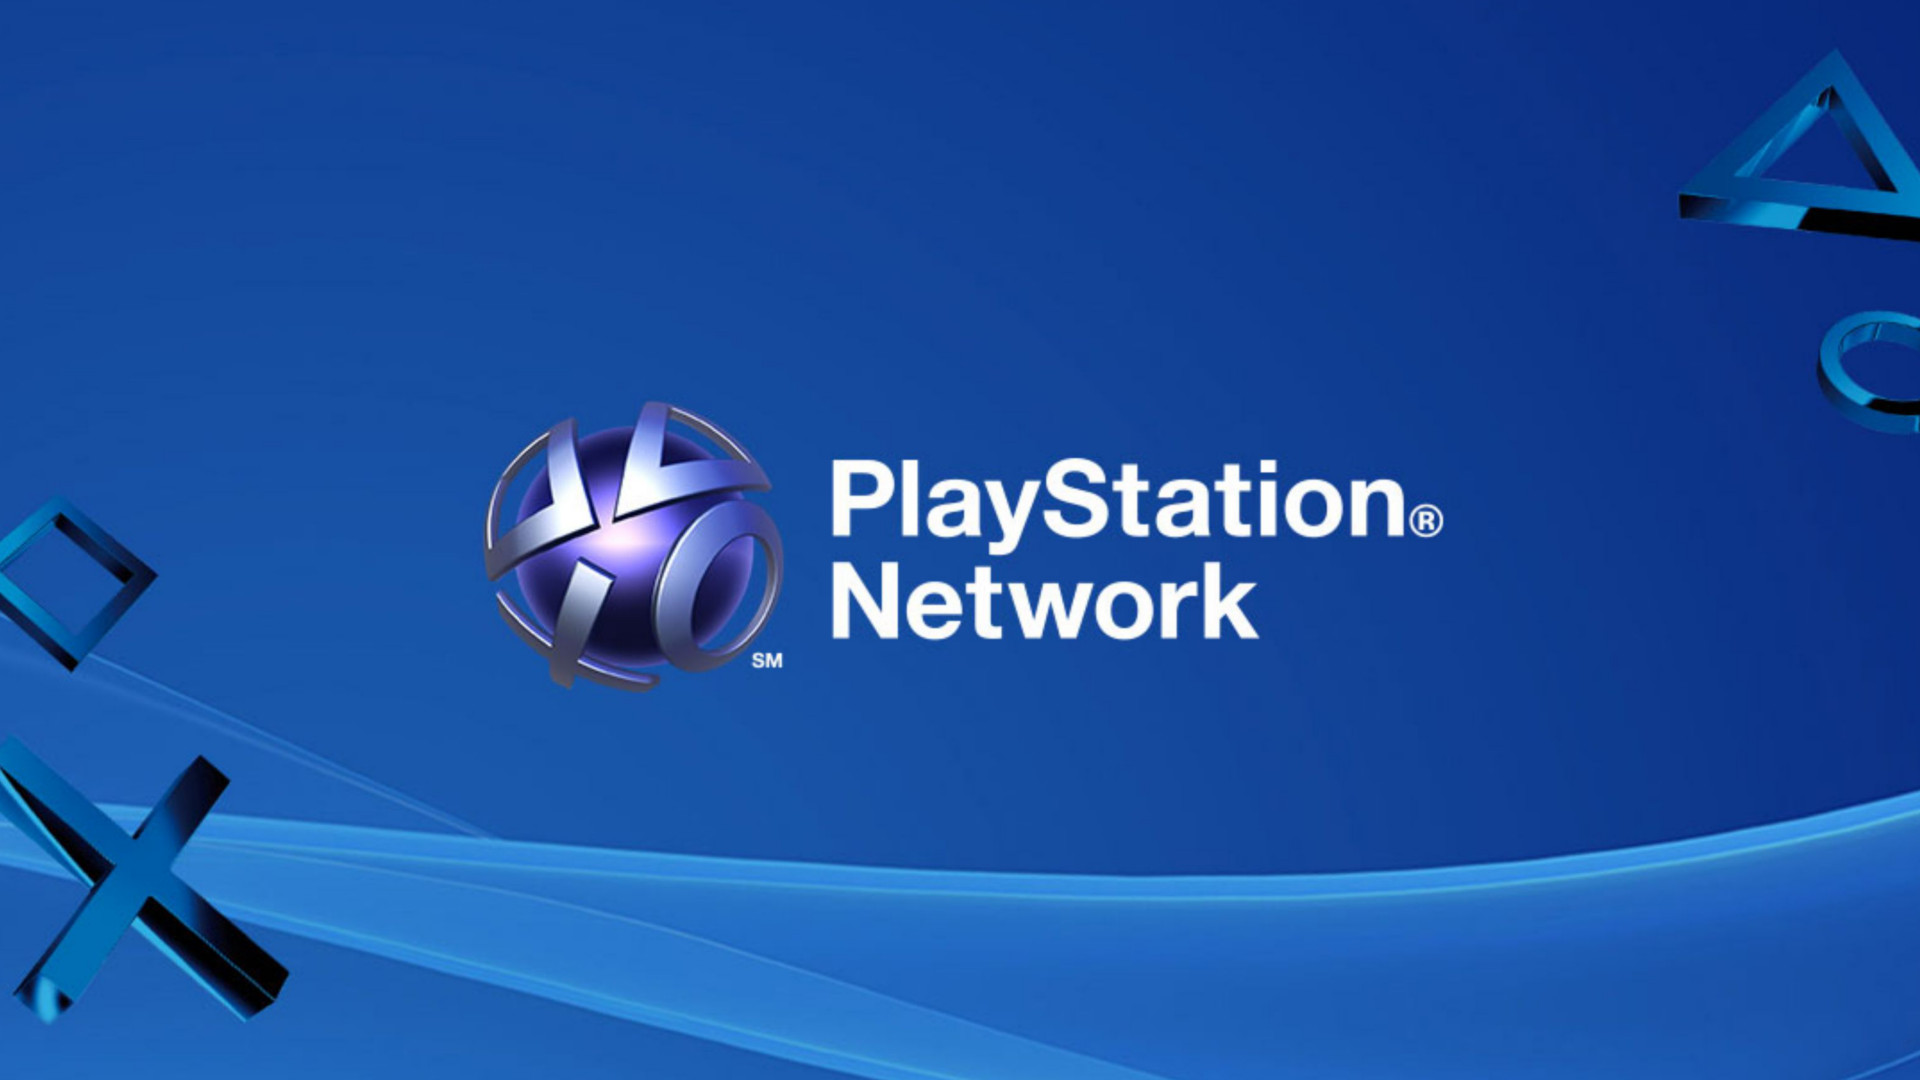 Adresse playstation angeben falsche network PlayStation Network: